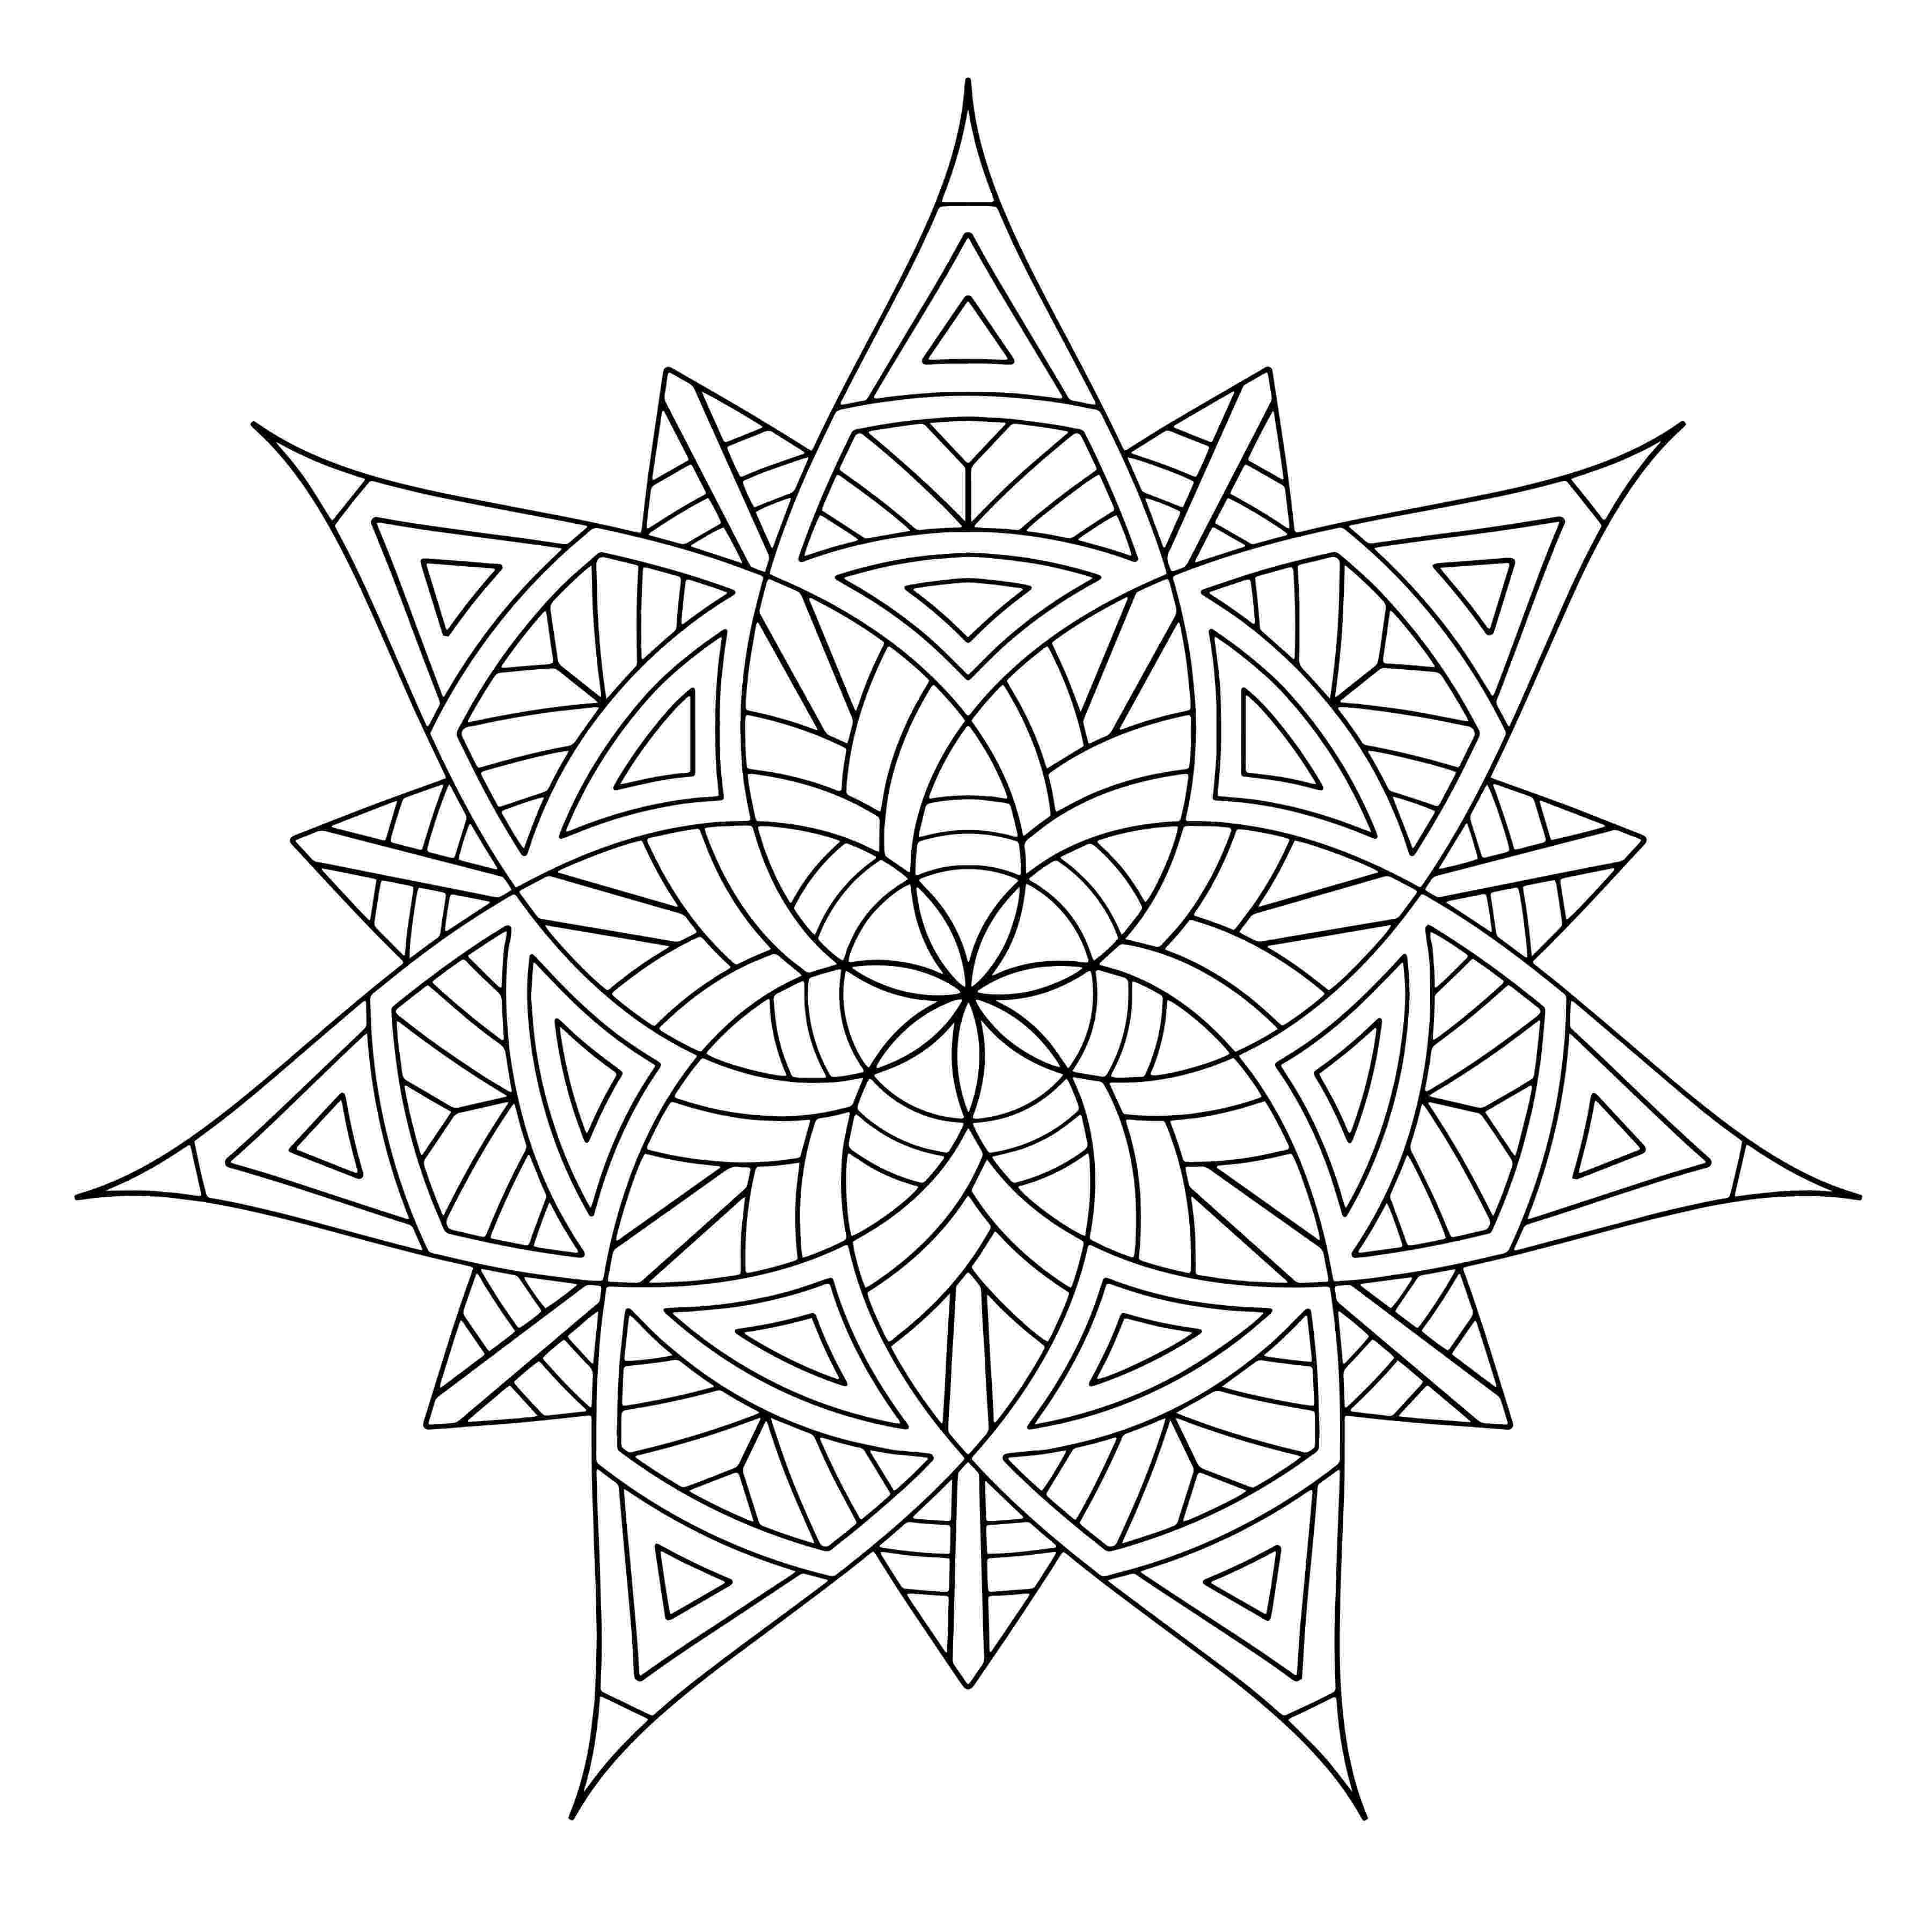 geometric coloring page free printable geometric coloring pages for kids page geometric coloring